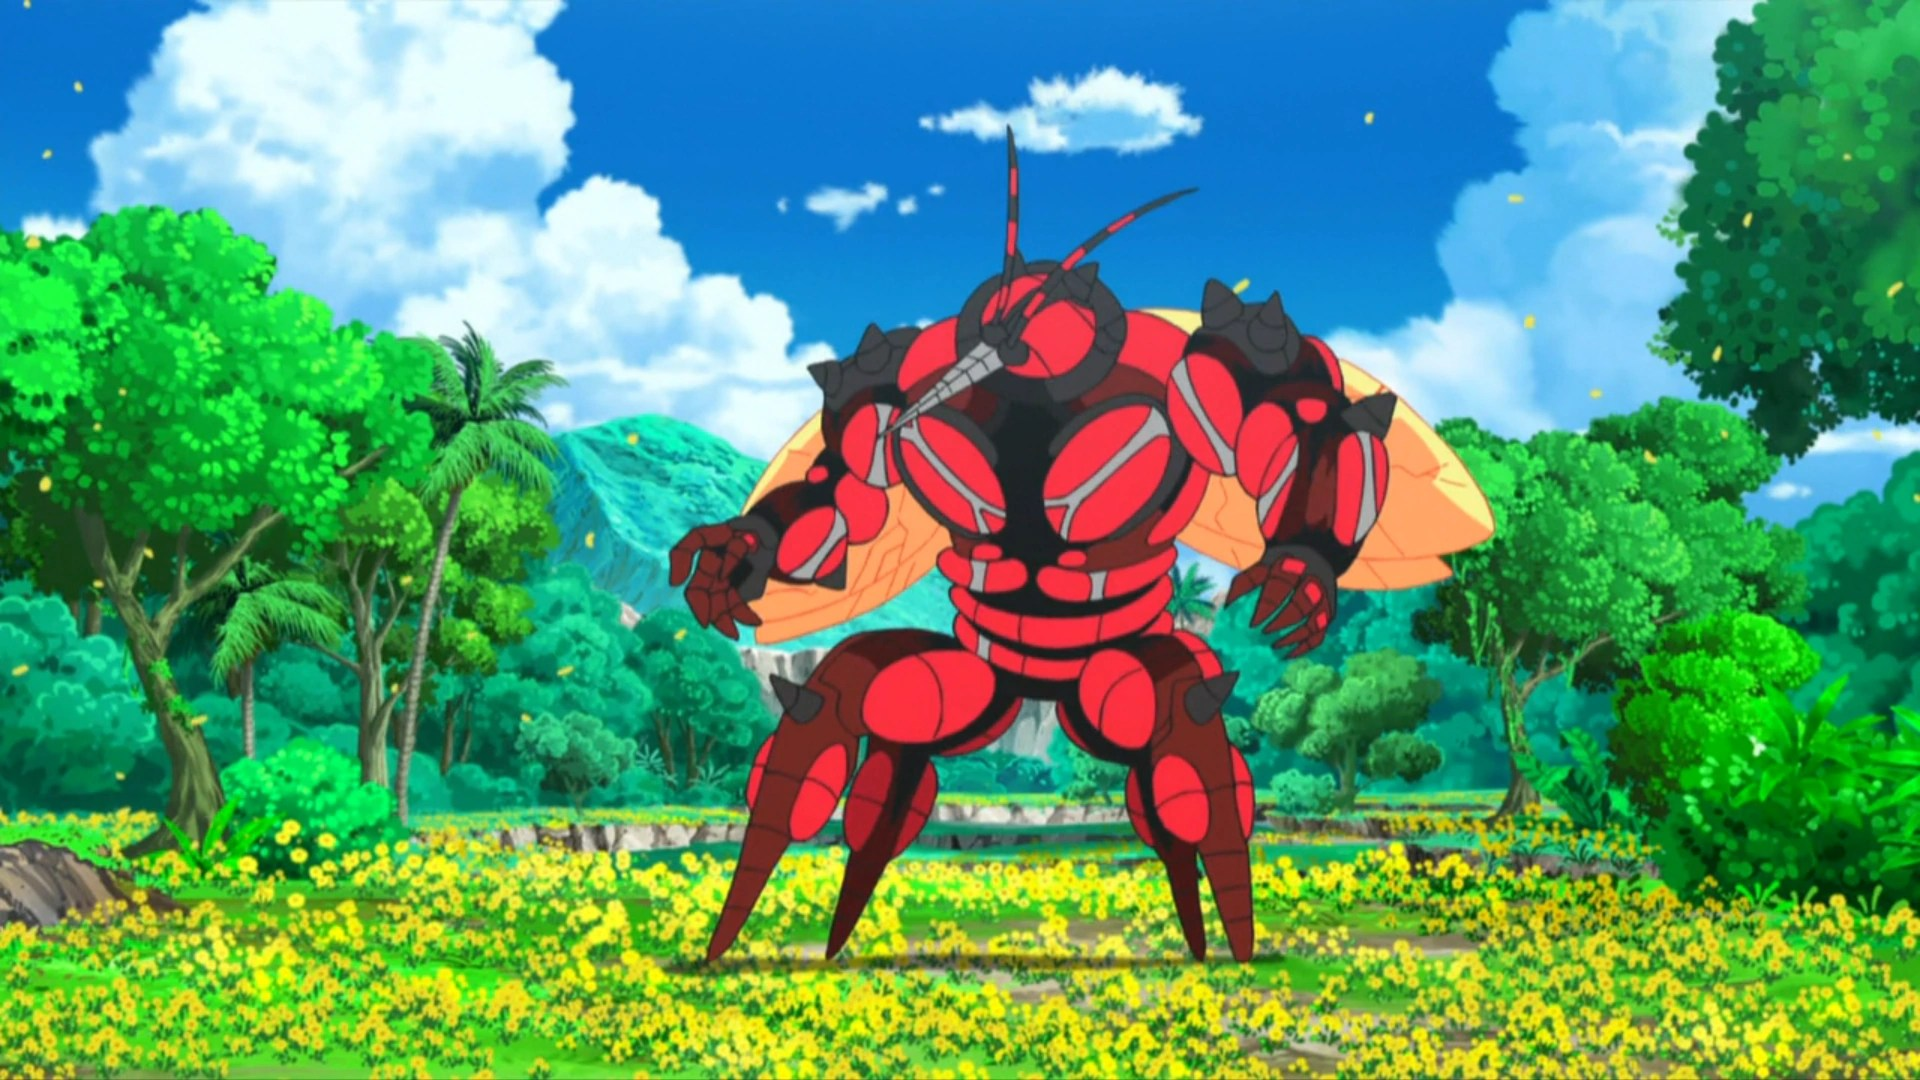 Black And Blue Wallpaper Buzzwole Anime Pok 233 Mon Wiki Fandom Powered By Wikia